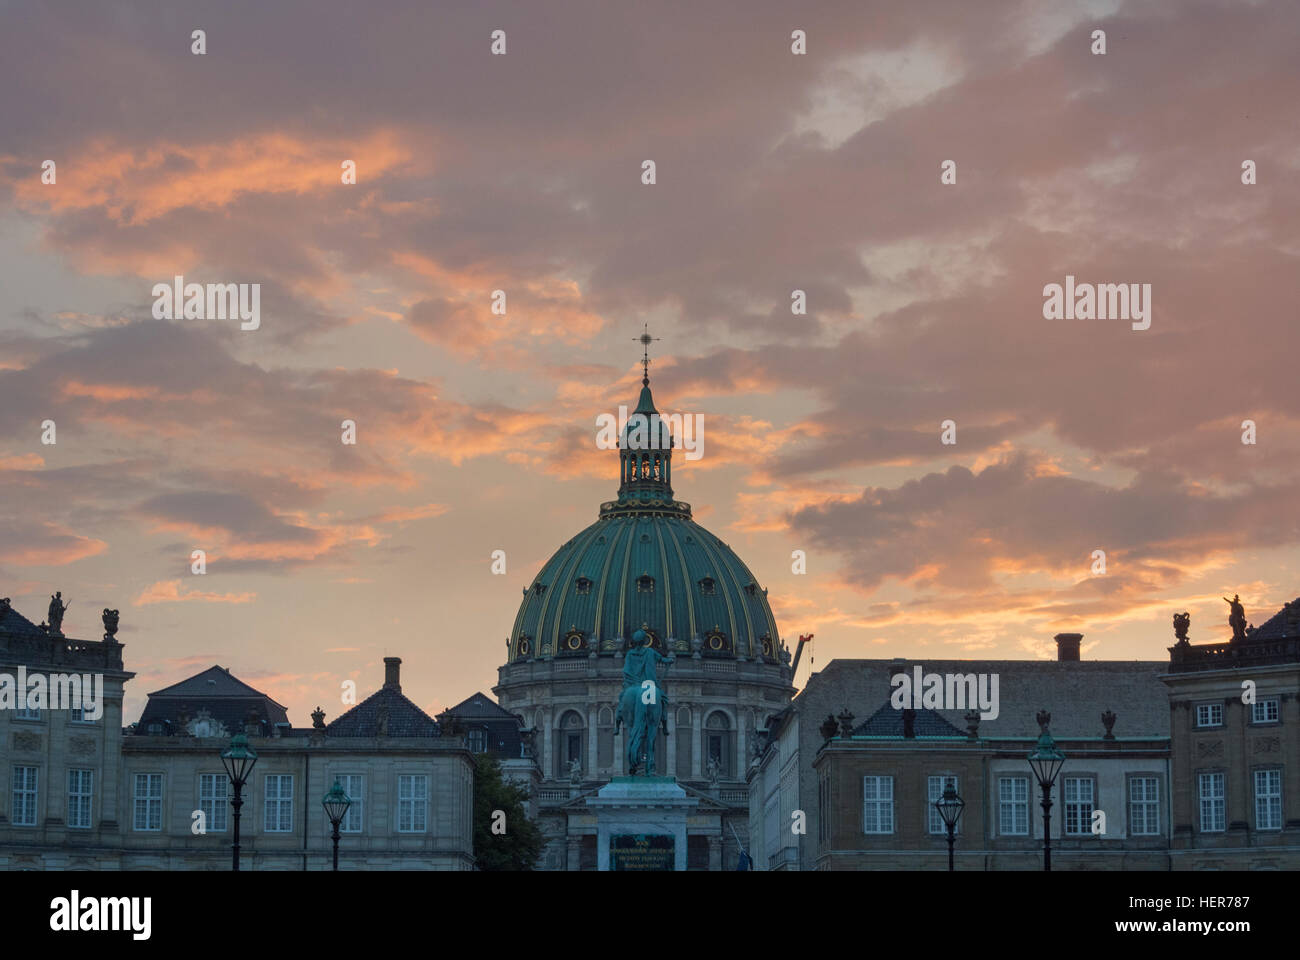 The Amalienborg at sunset in Copenhagen - Stock Image